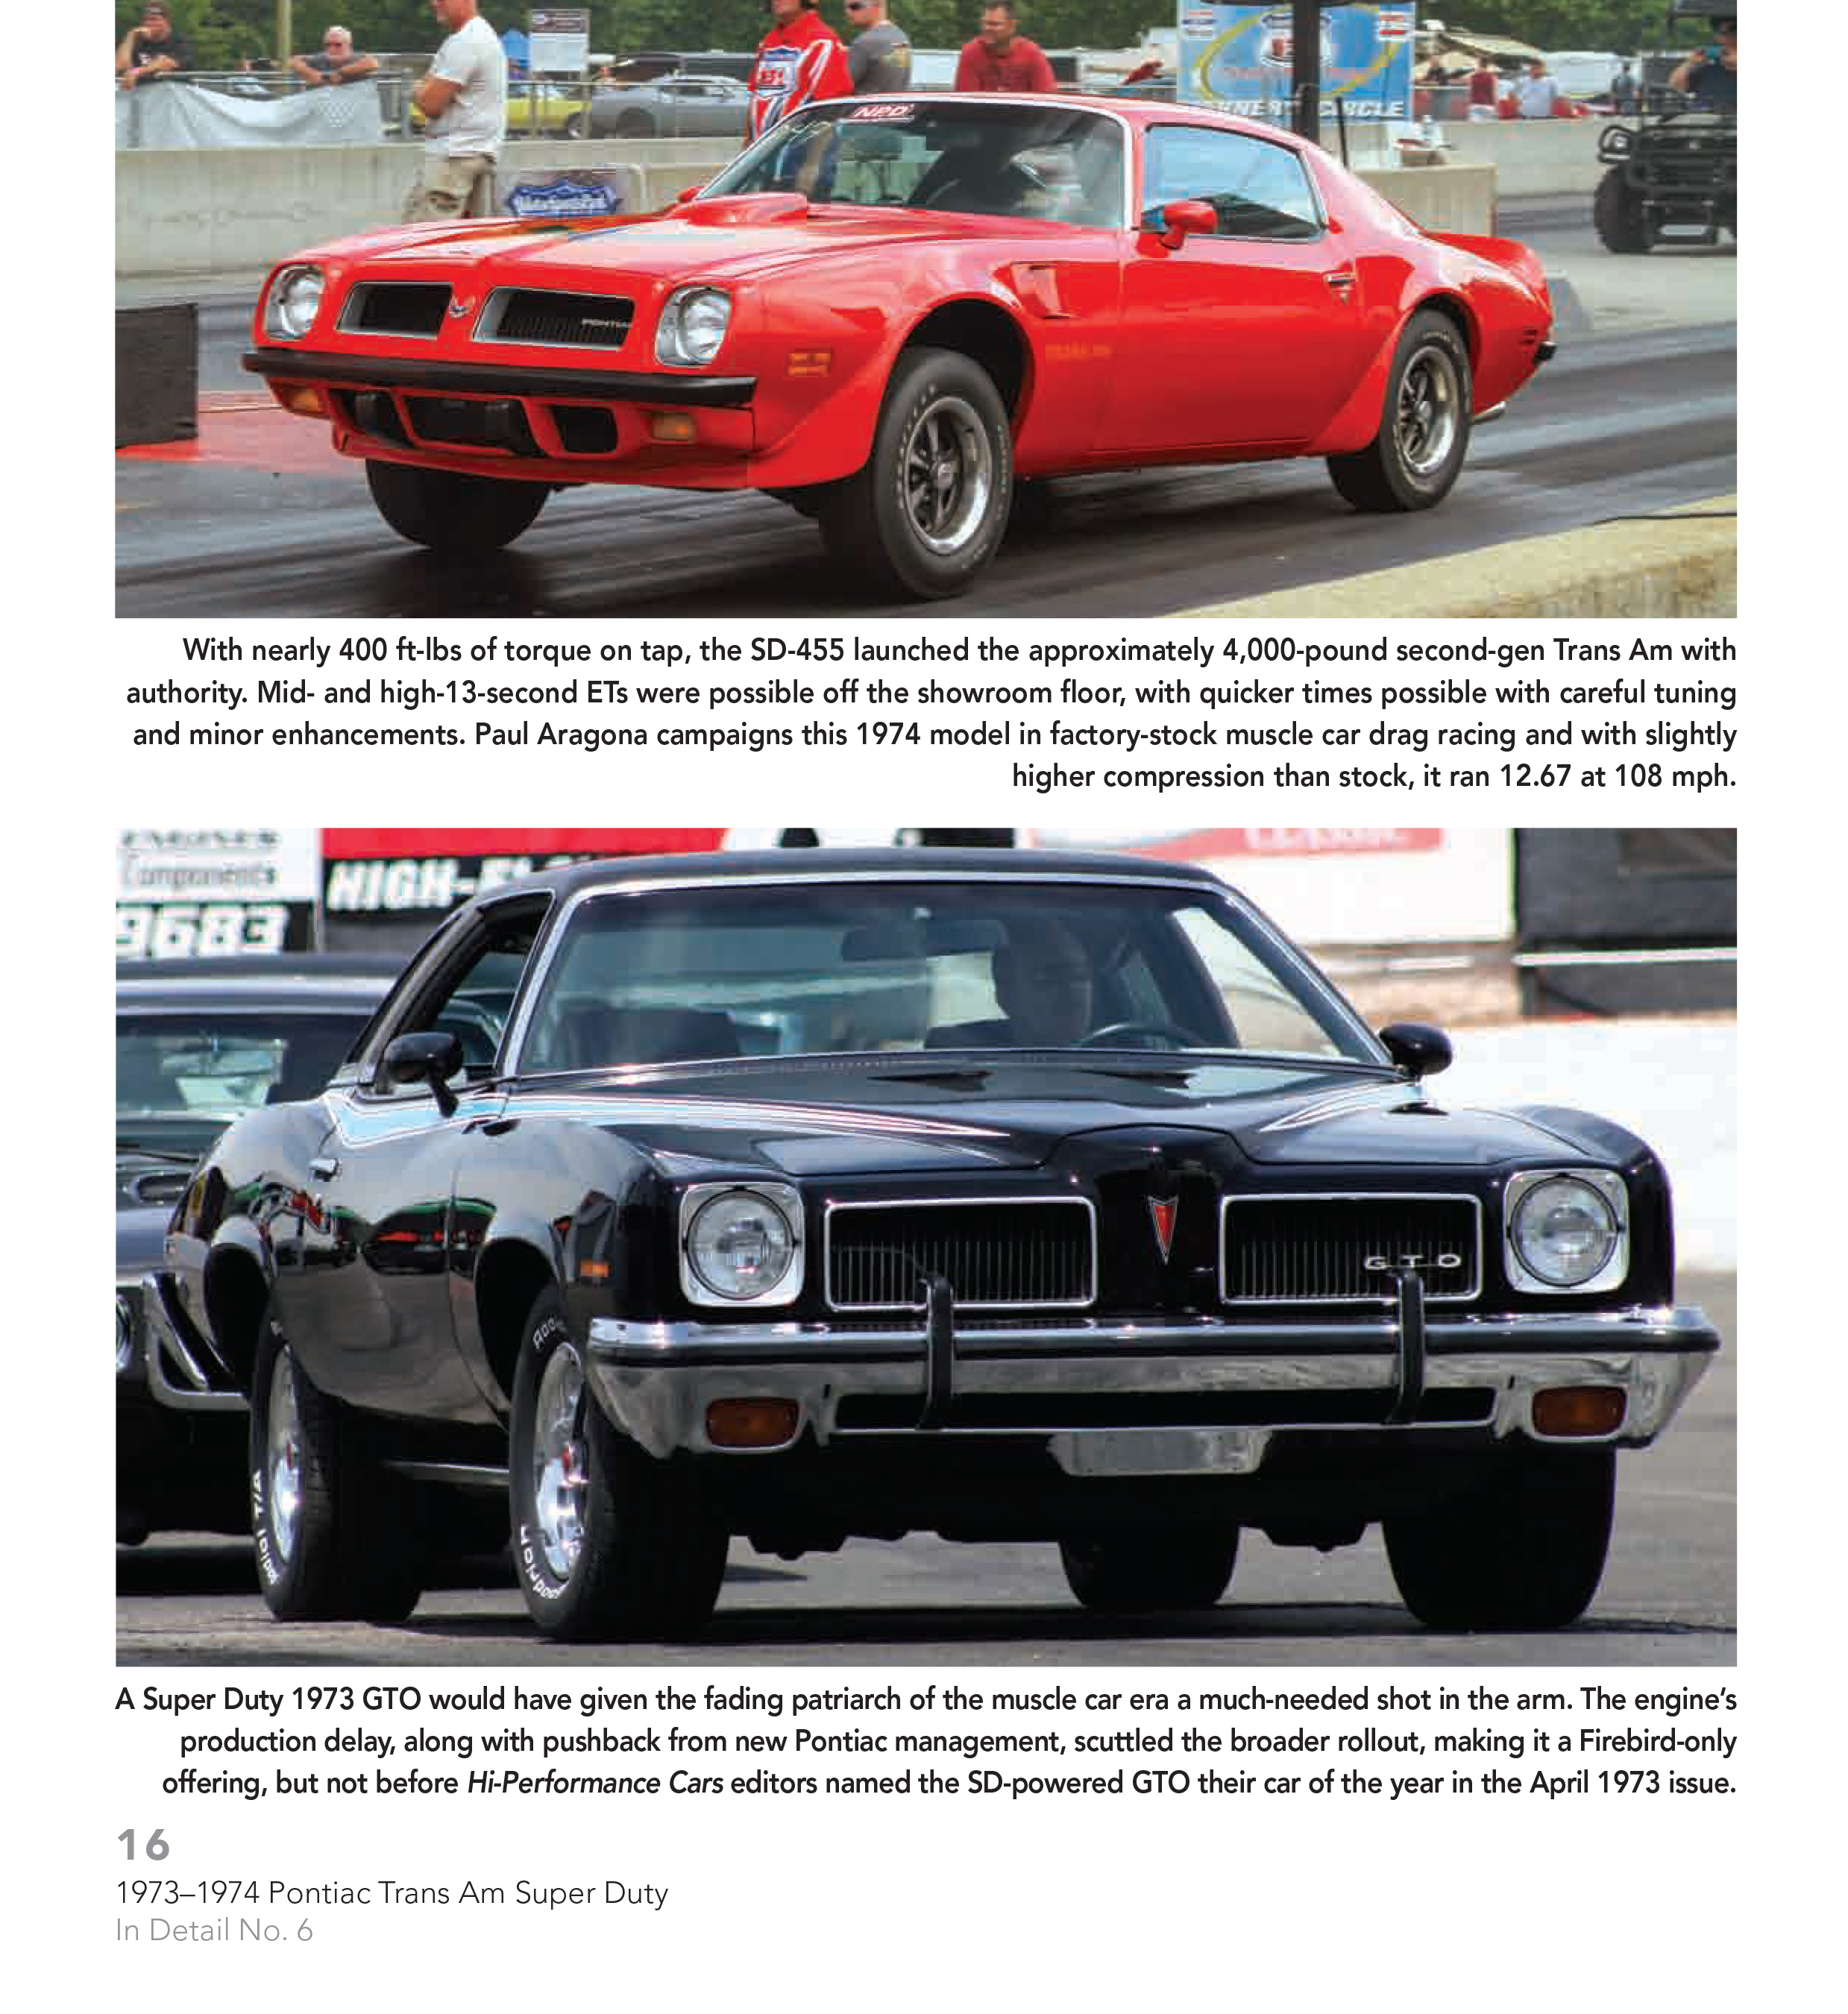 TRANS AM 1973 1974 PONTIAC TRANS AM SUPER DUTY 455: MUSCLE CARS IN ...